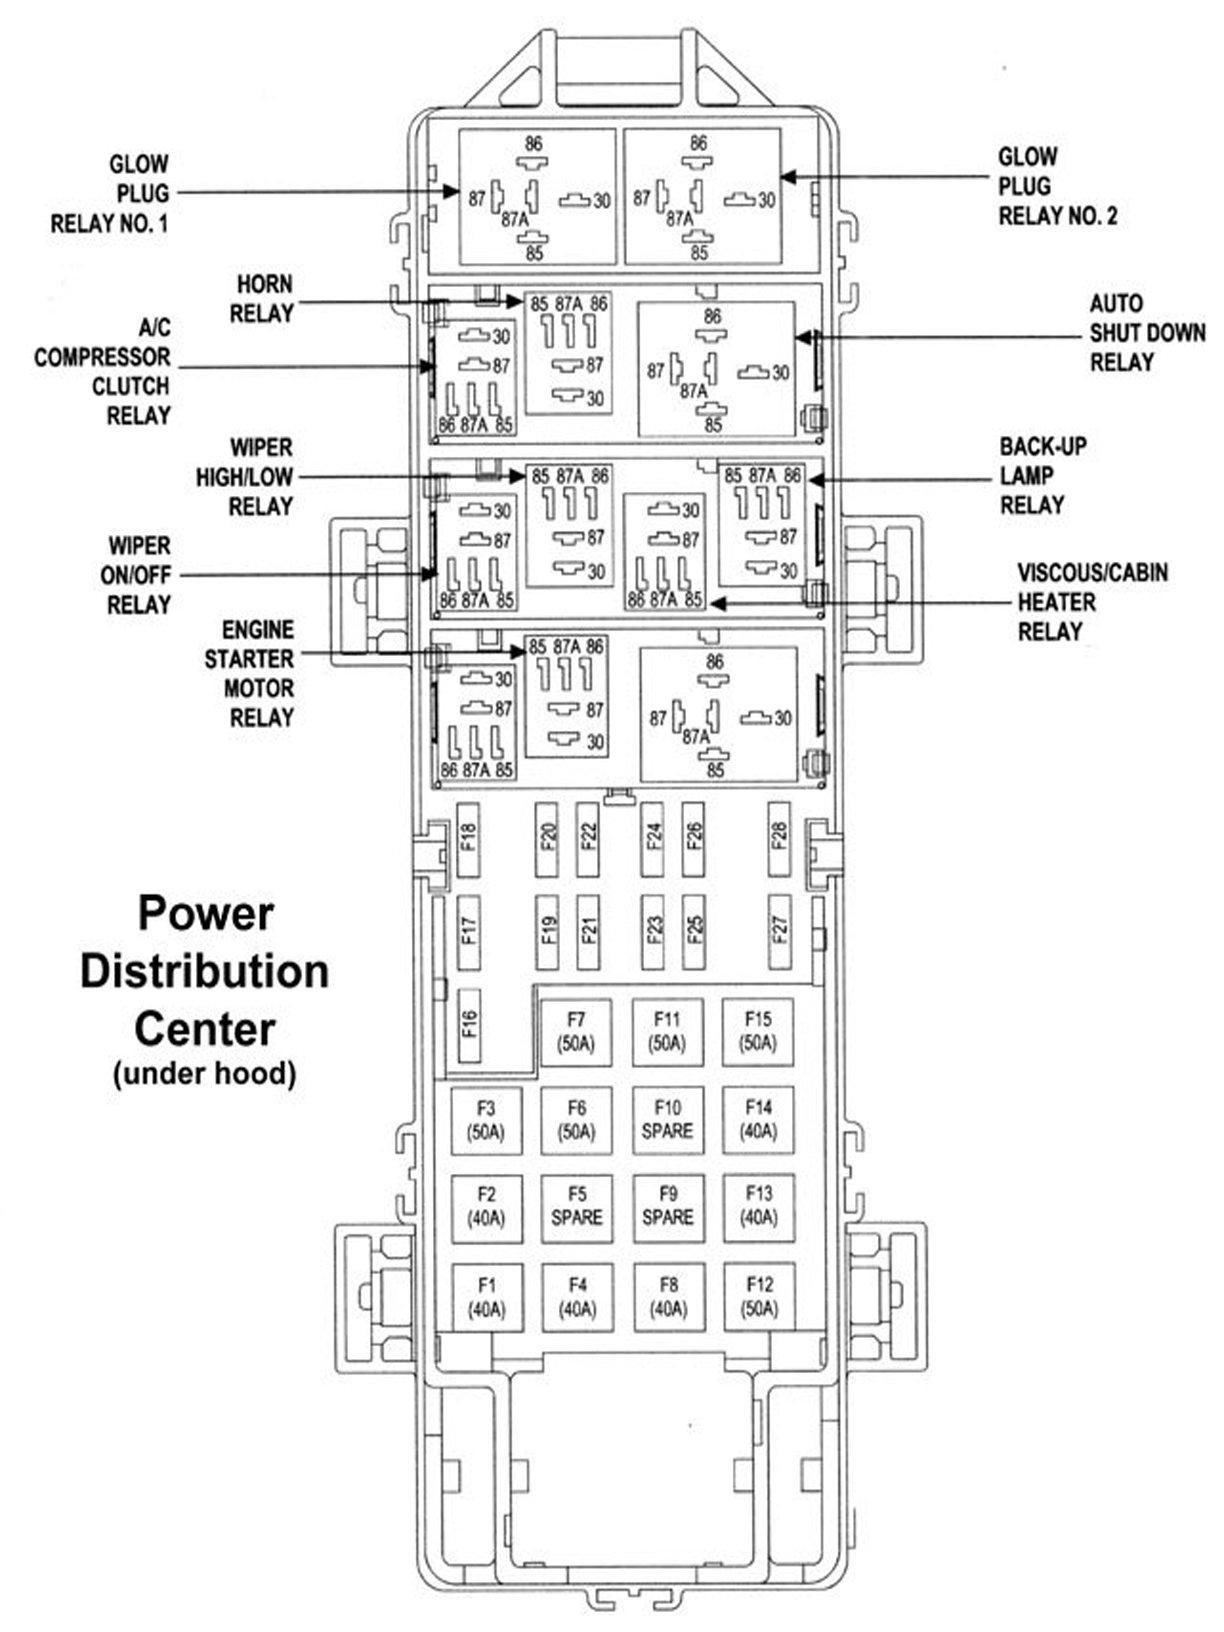 1999 Jeep Grand Cherokee Laredo Fuse Box - Wiring Diagrams Hubs - 2004 Jeep Grand Cherokee Wiring Diagram